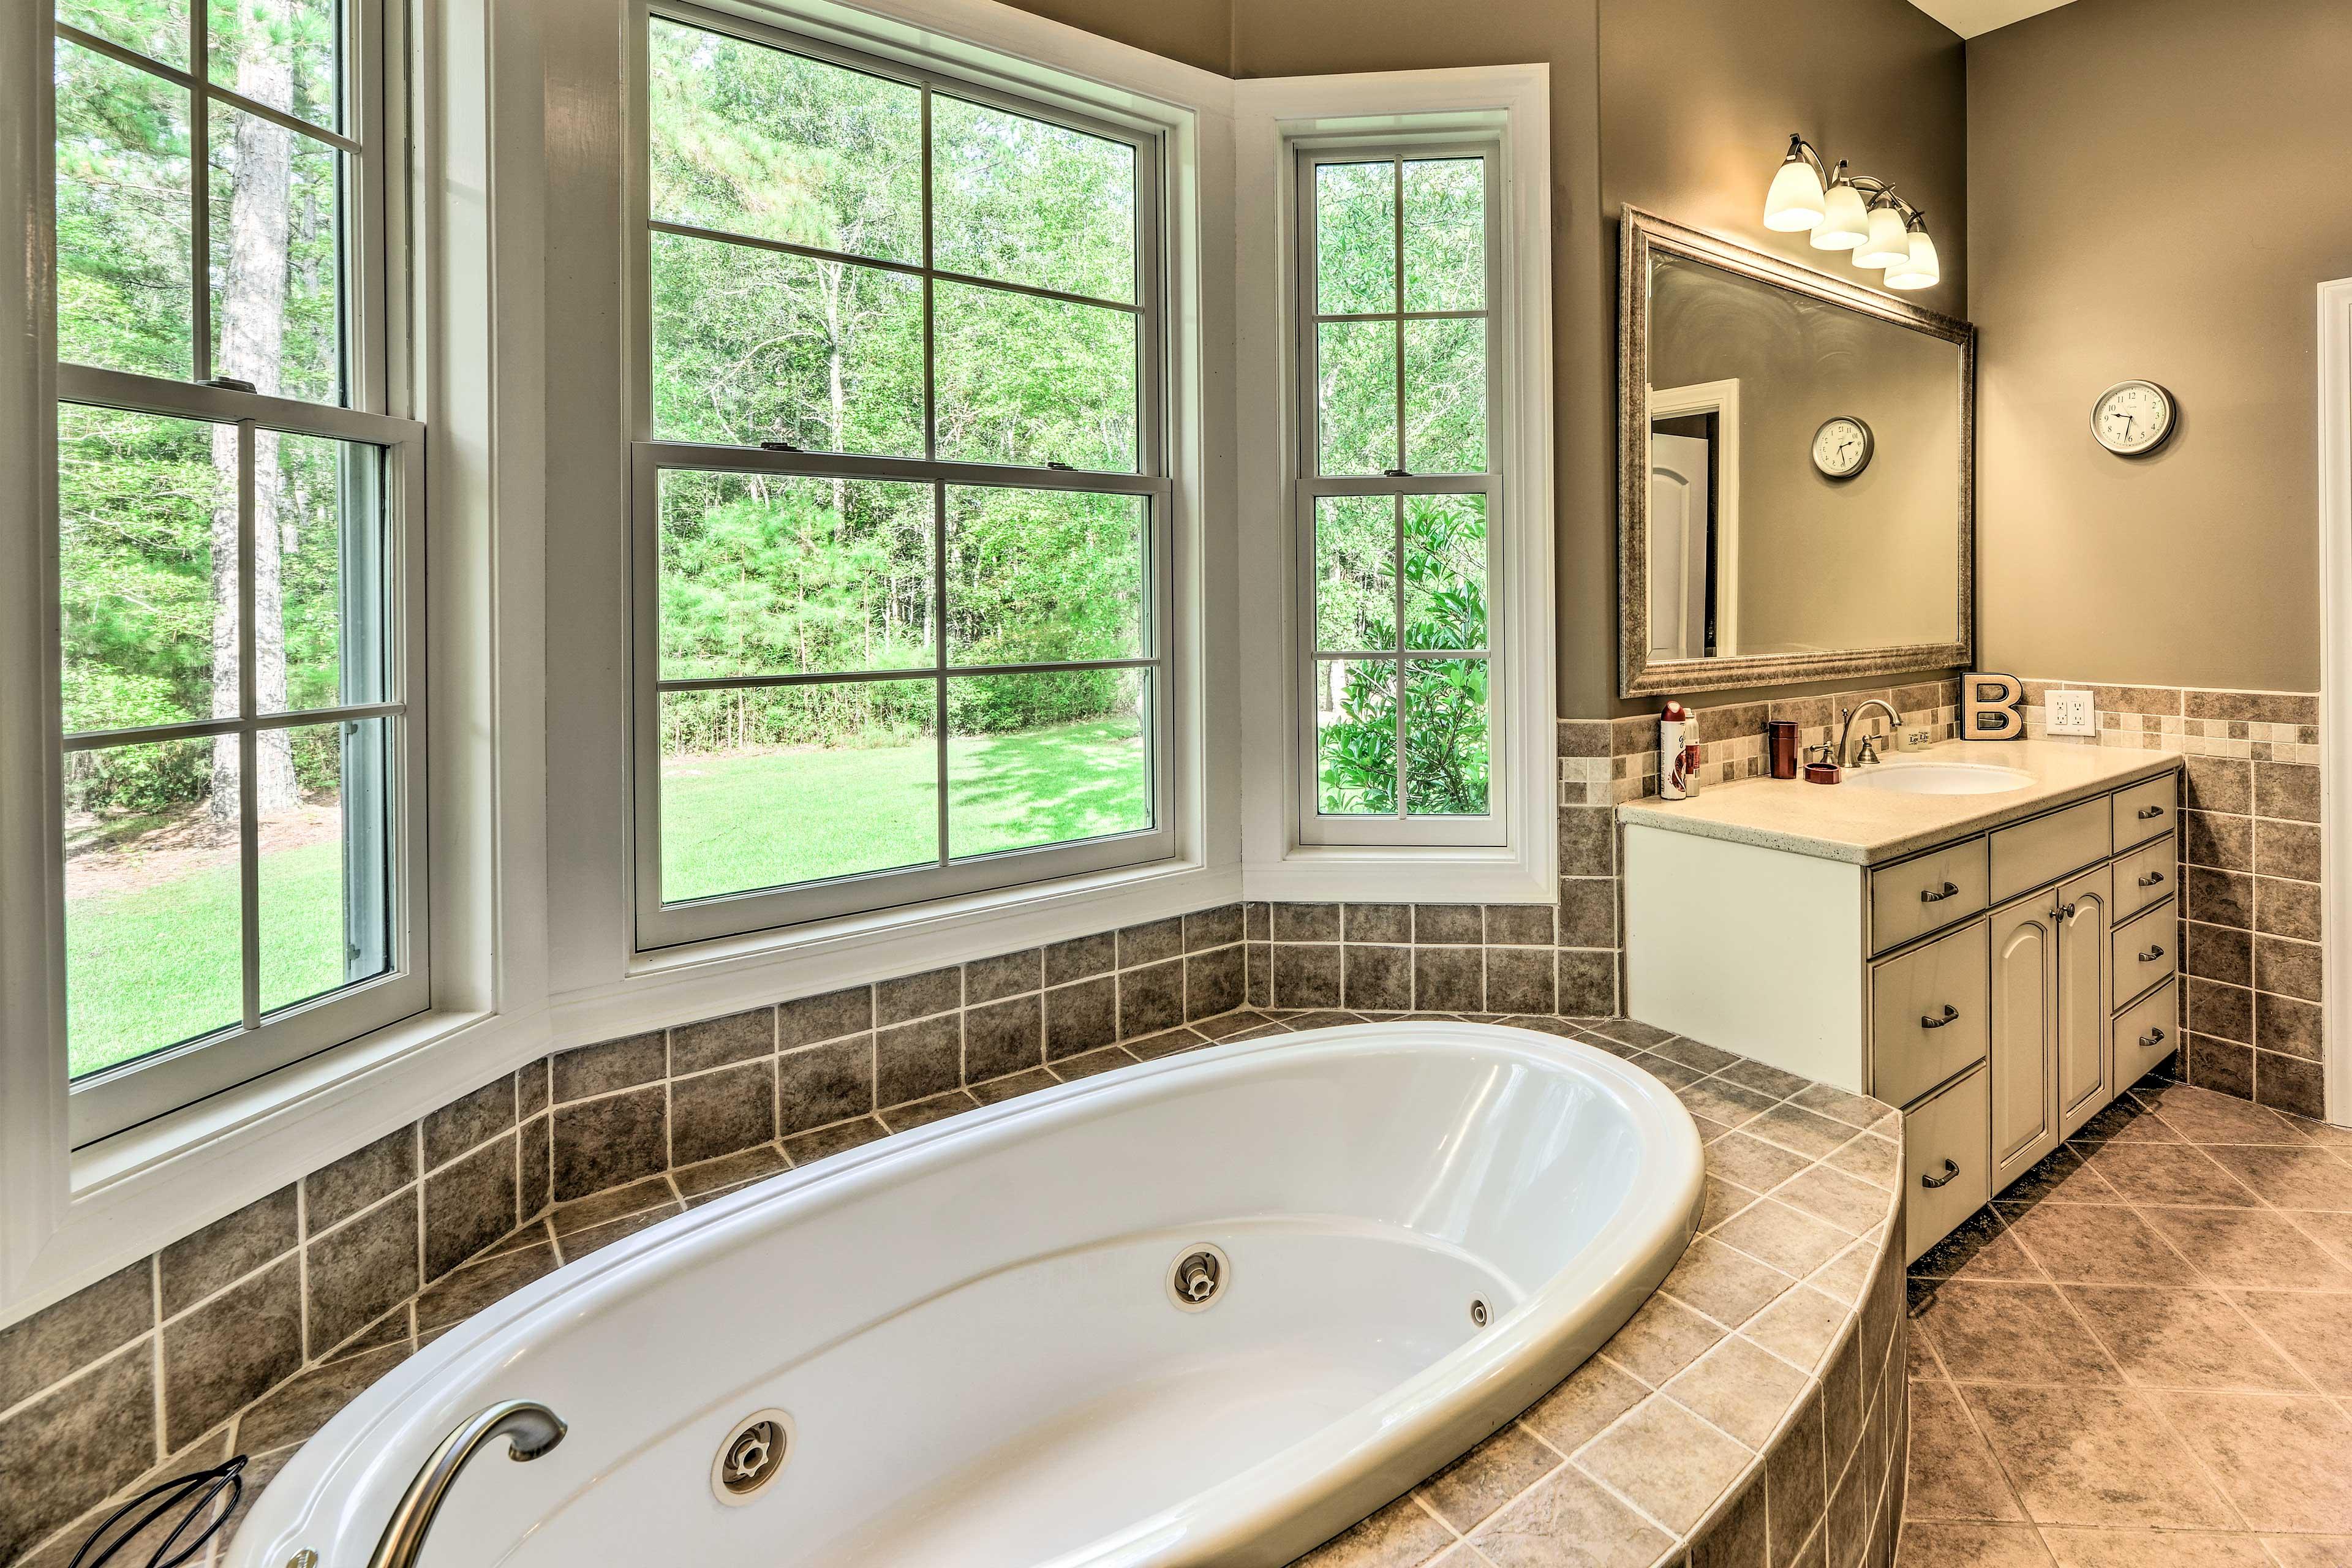 The bathroom has separate vanities to make getting ready easy!